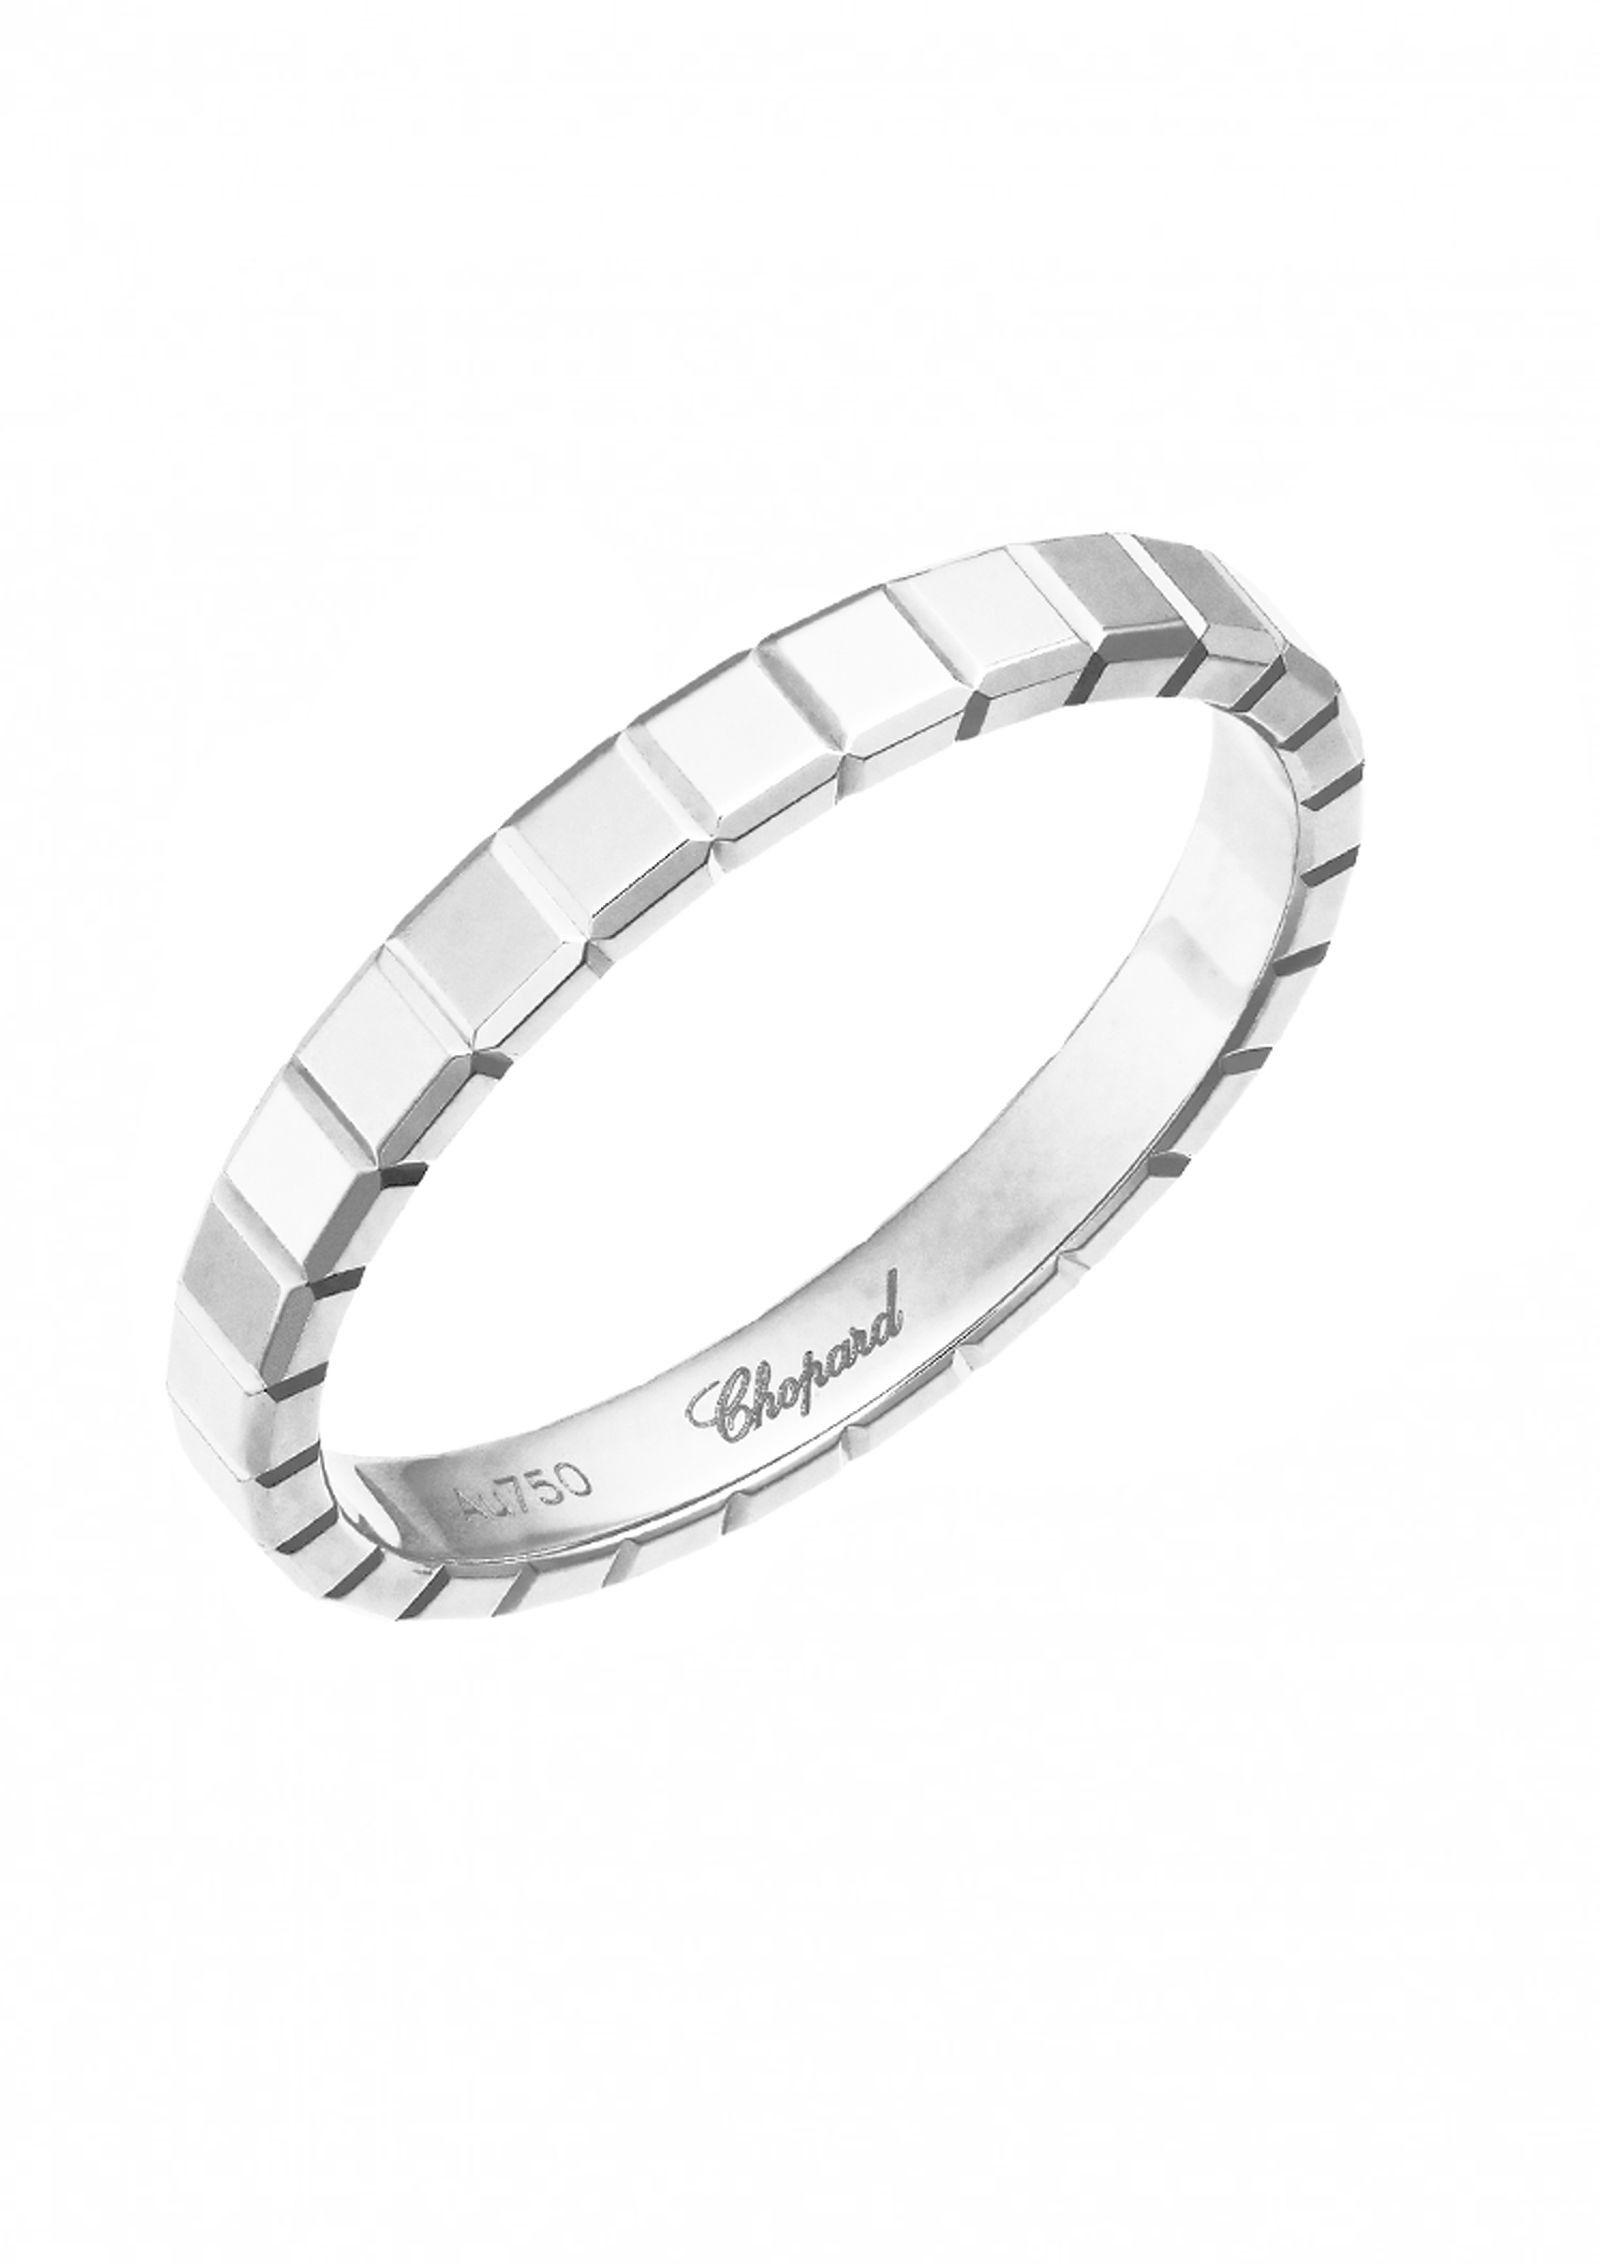 Chopard Ice Cube Mini Diamond Ring in 18K White Gold, Size 53